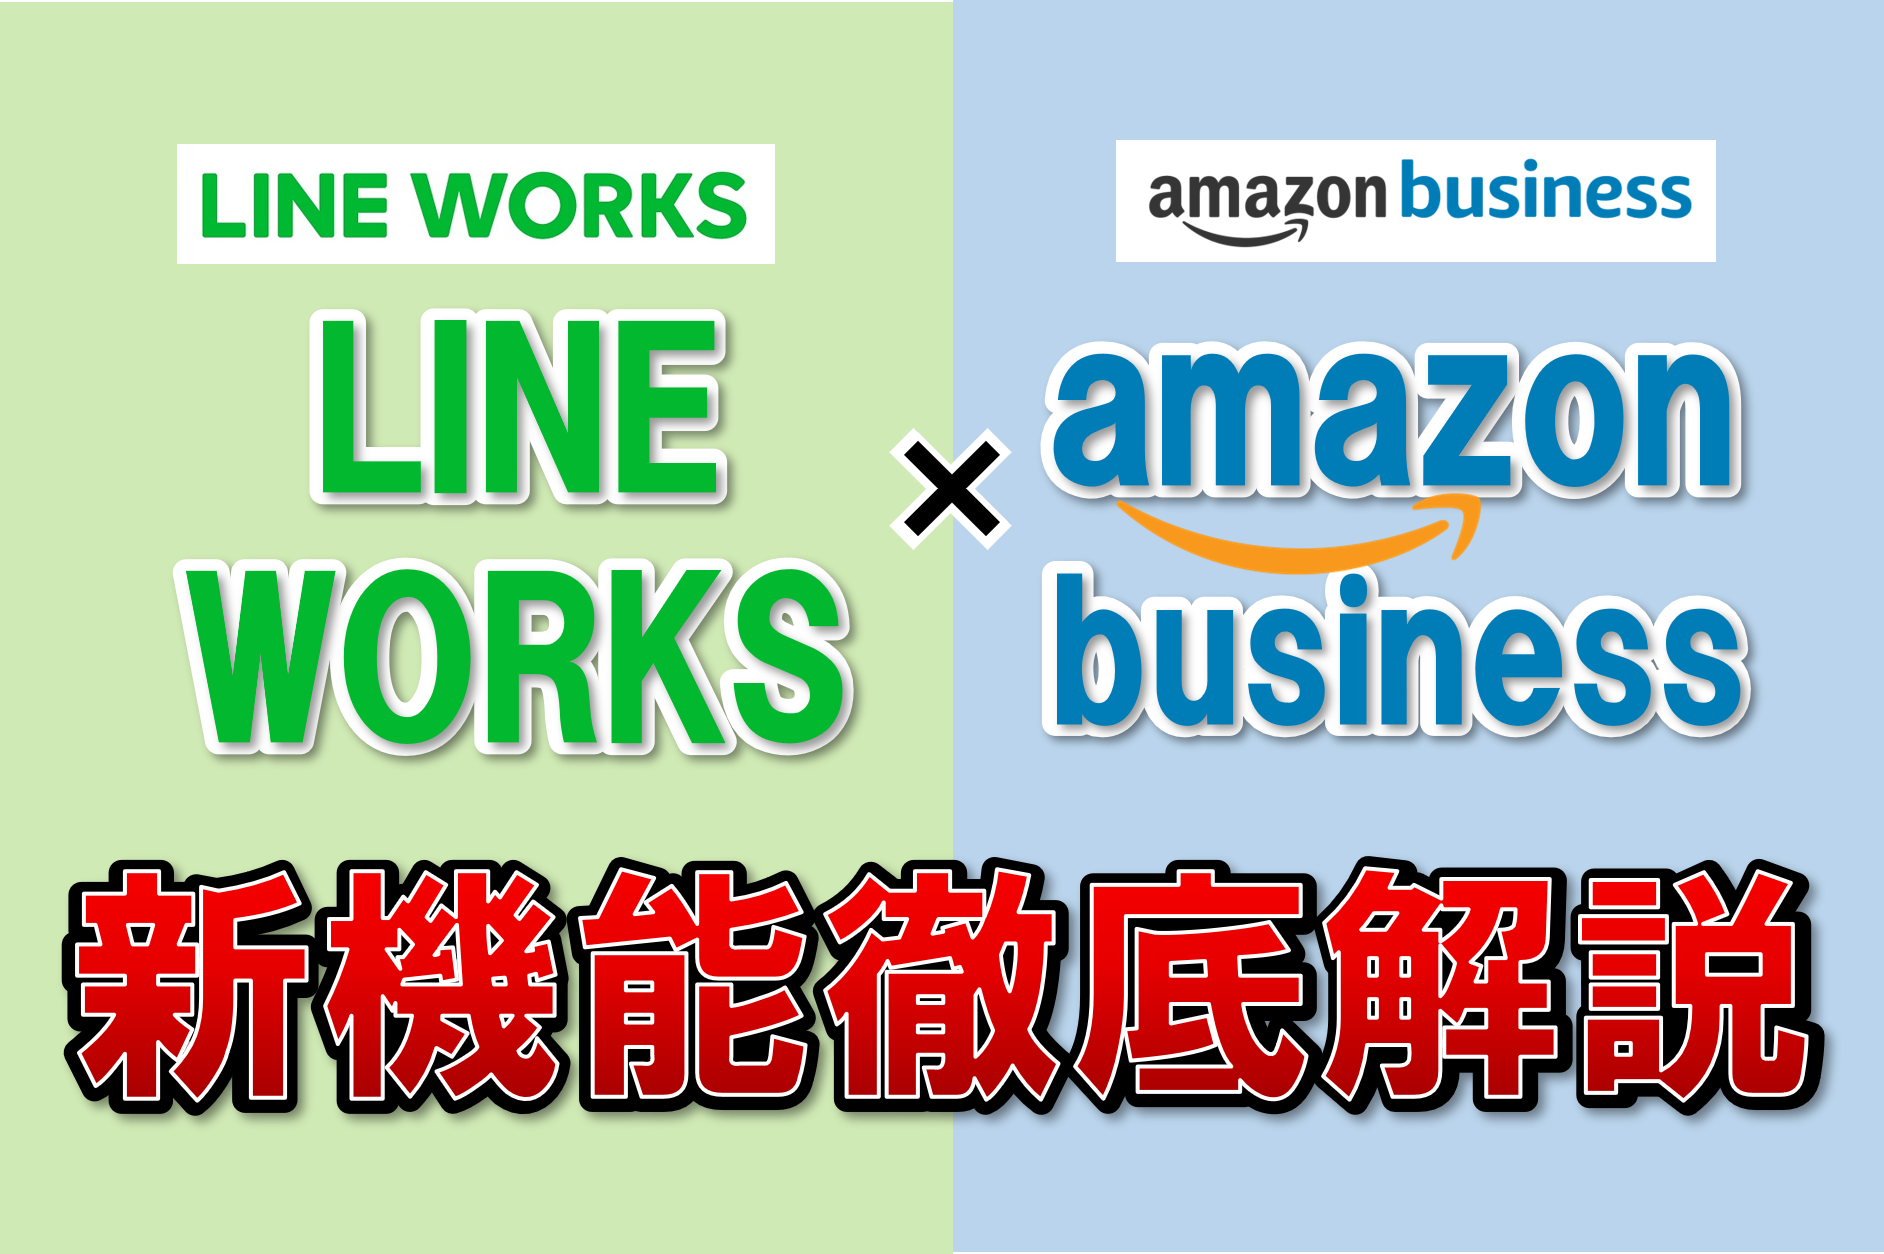 LINEWORKS(ラインワークス)×Amazonbusiness(アマゾンビジネス)新連携機能を早速使ってみた